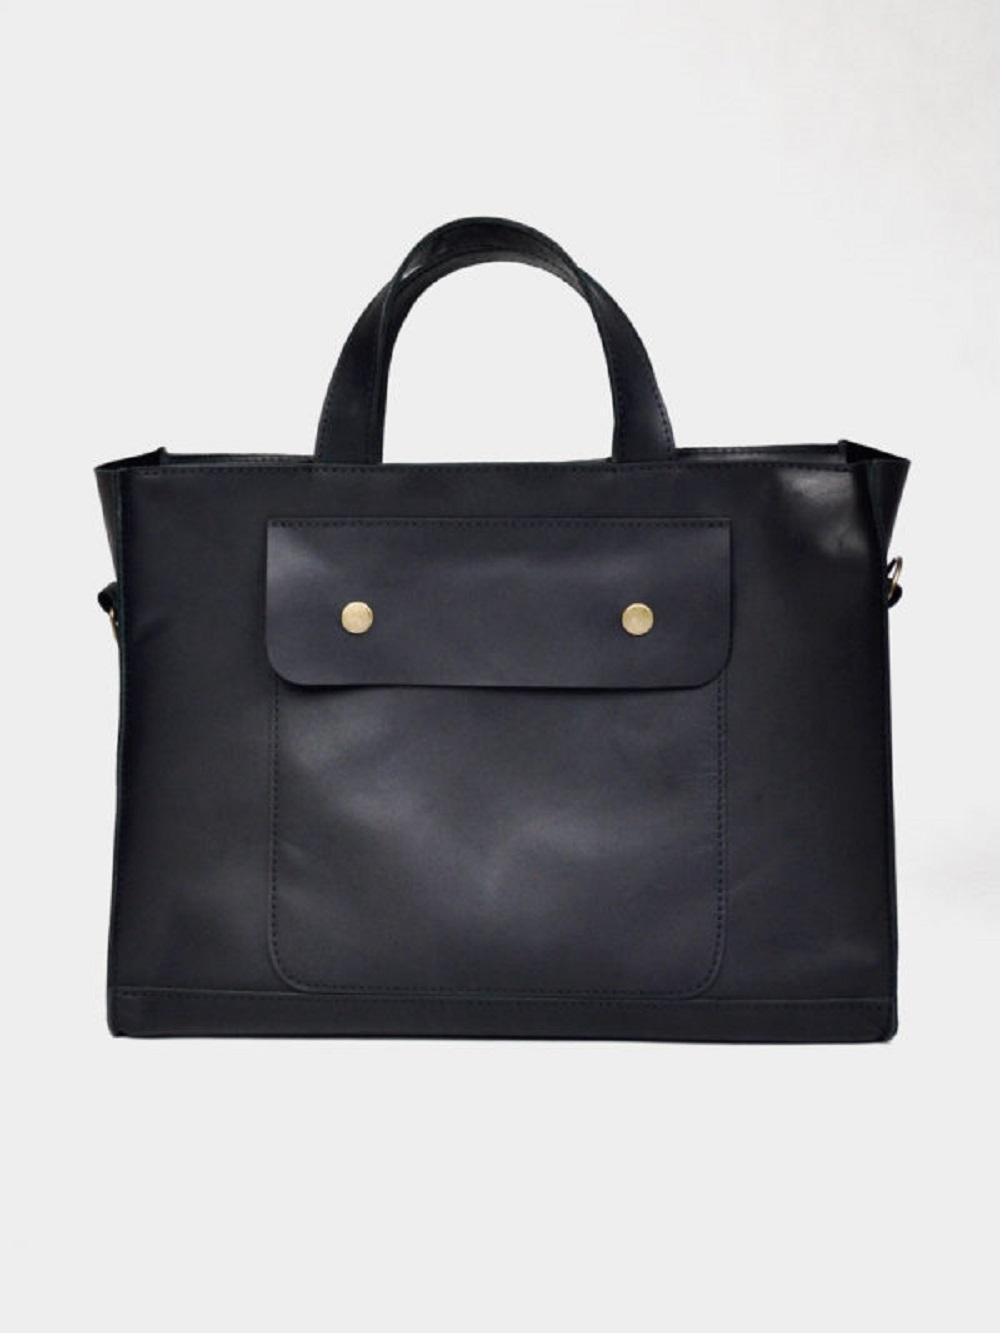 TORBA DAMSKA T03 DEEP BLACK - torebka unisex czarna - torebka z regulowanym paskiem unisex - torba skórzana czarna retro - Lezerton